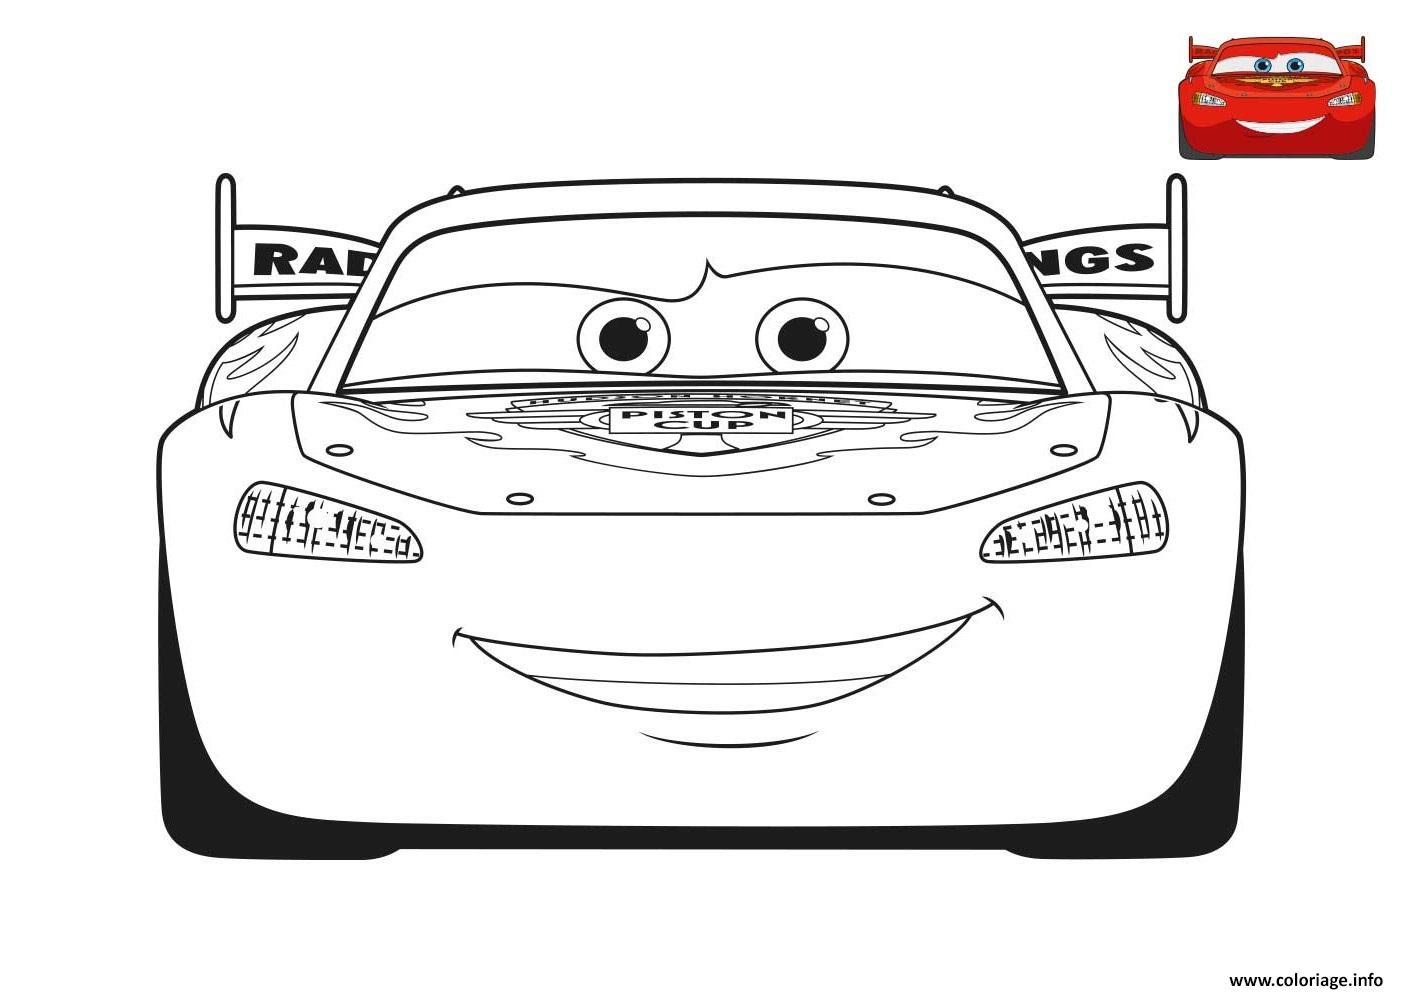 Coloriage Film Cars 3 Flash Mcqueen Voiture Rouge Dessin tout Coloriage De Flash Mcqueen